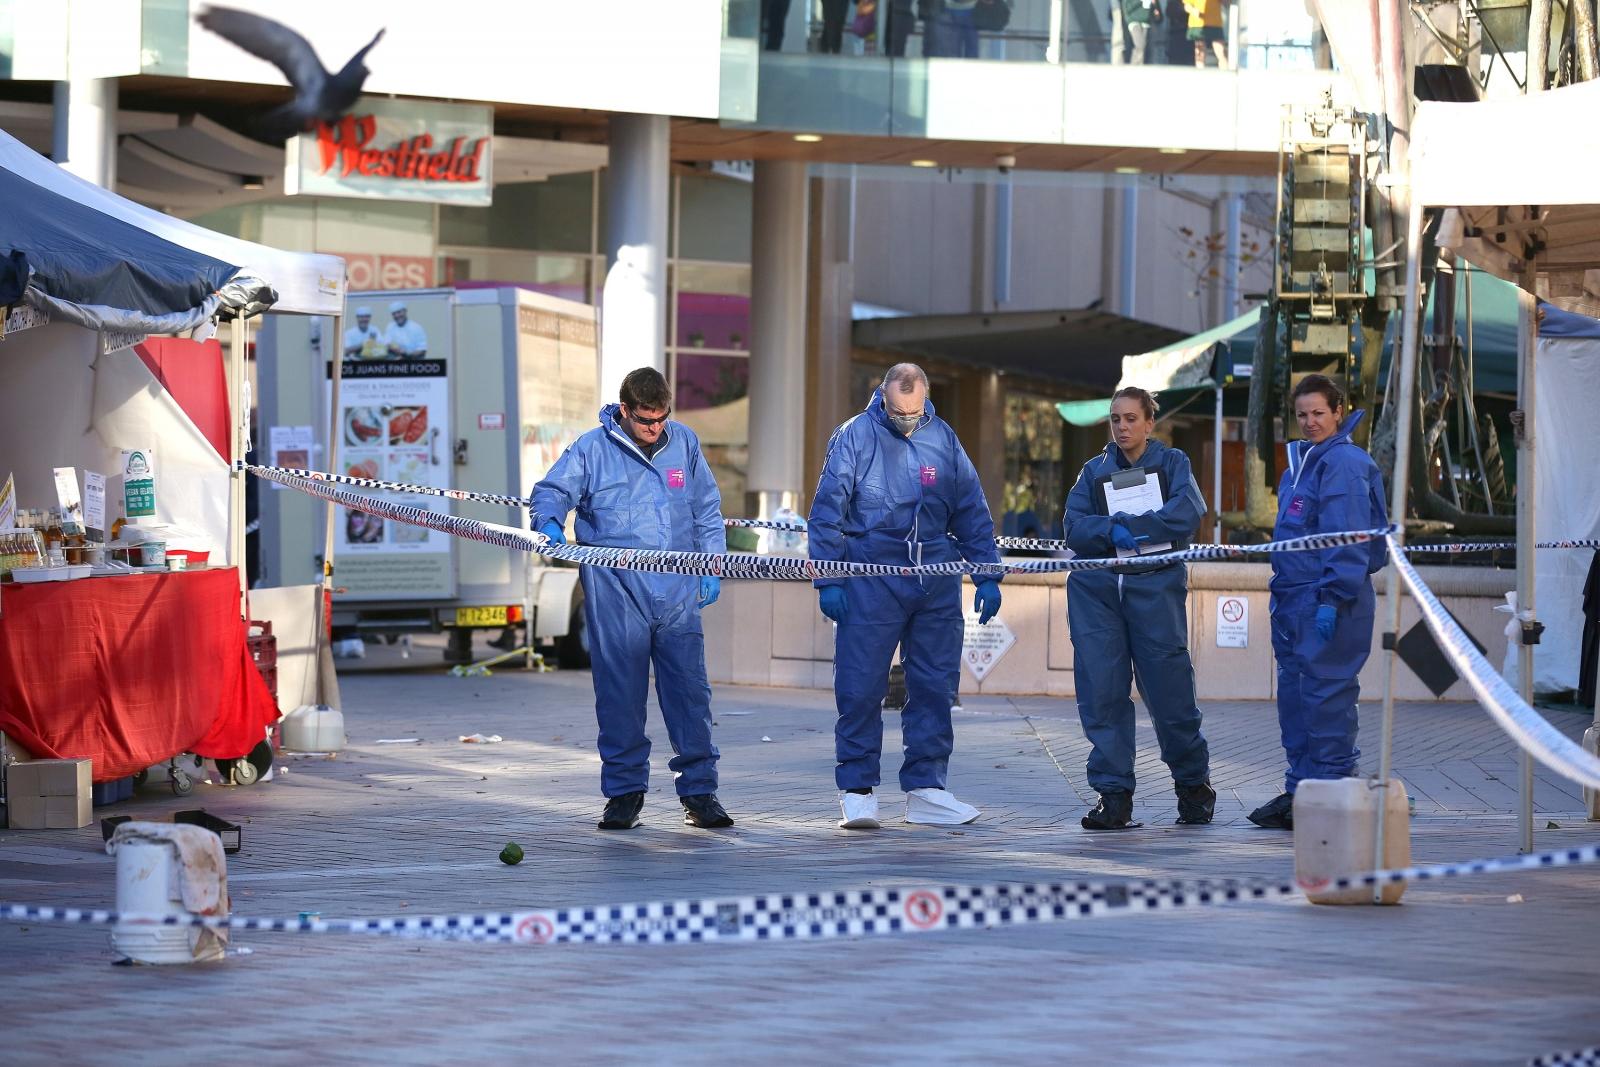 Sydney police firing